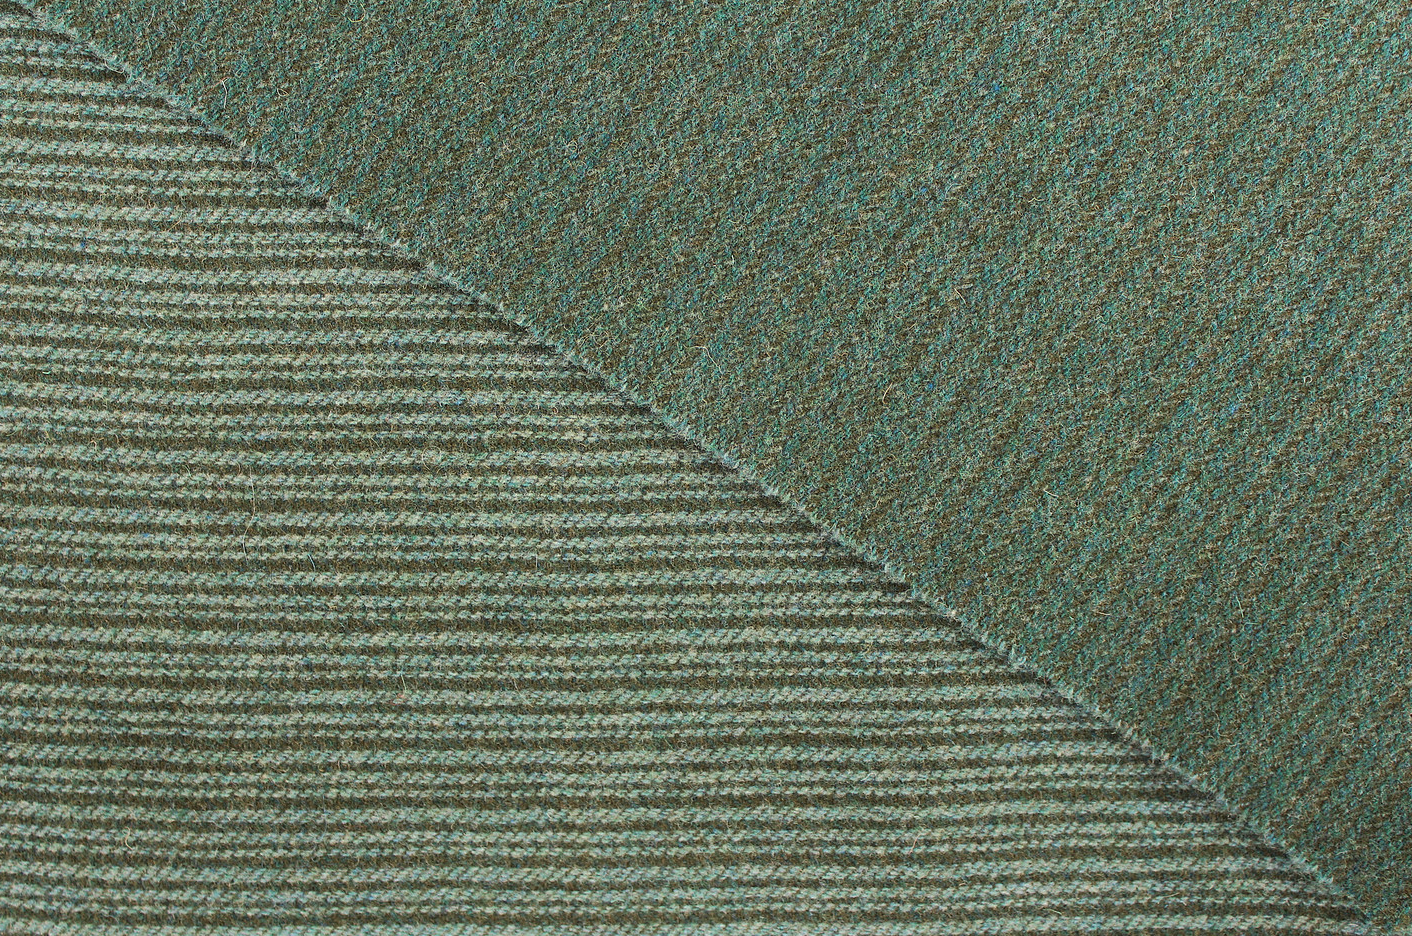 Seaward Bound 9 X 14 100% Wool